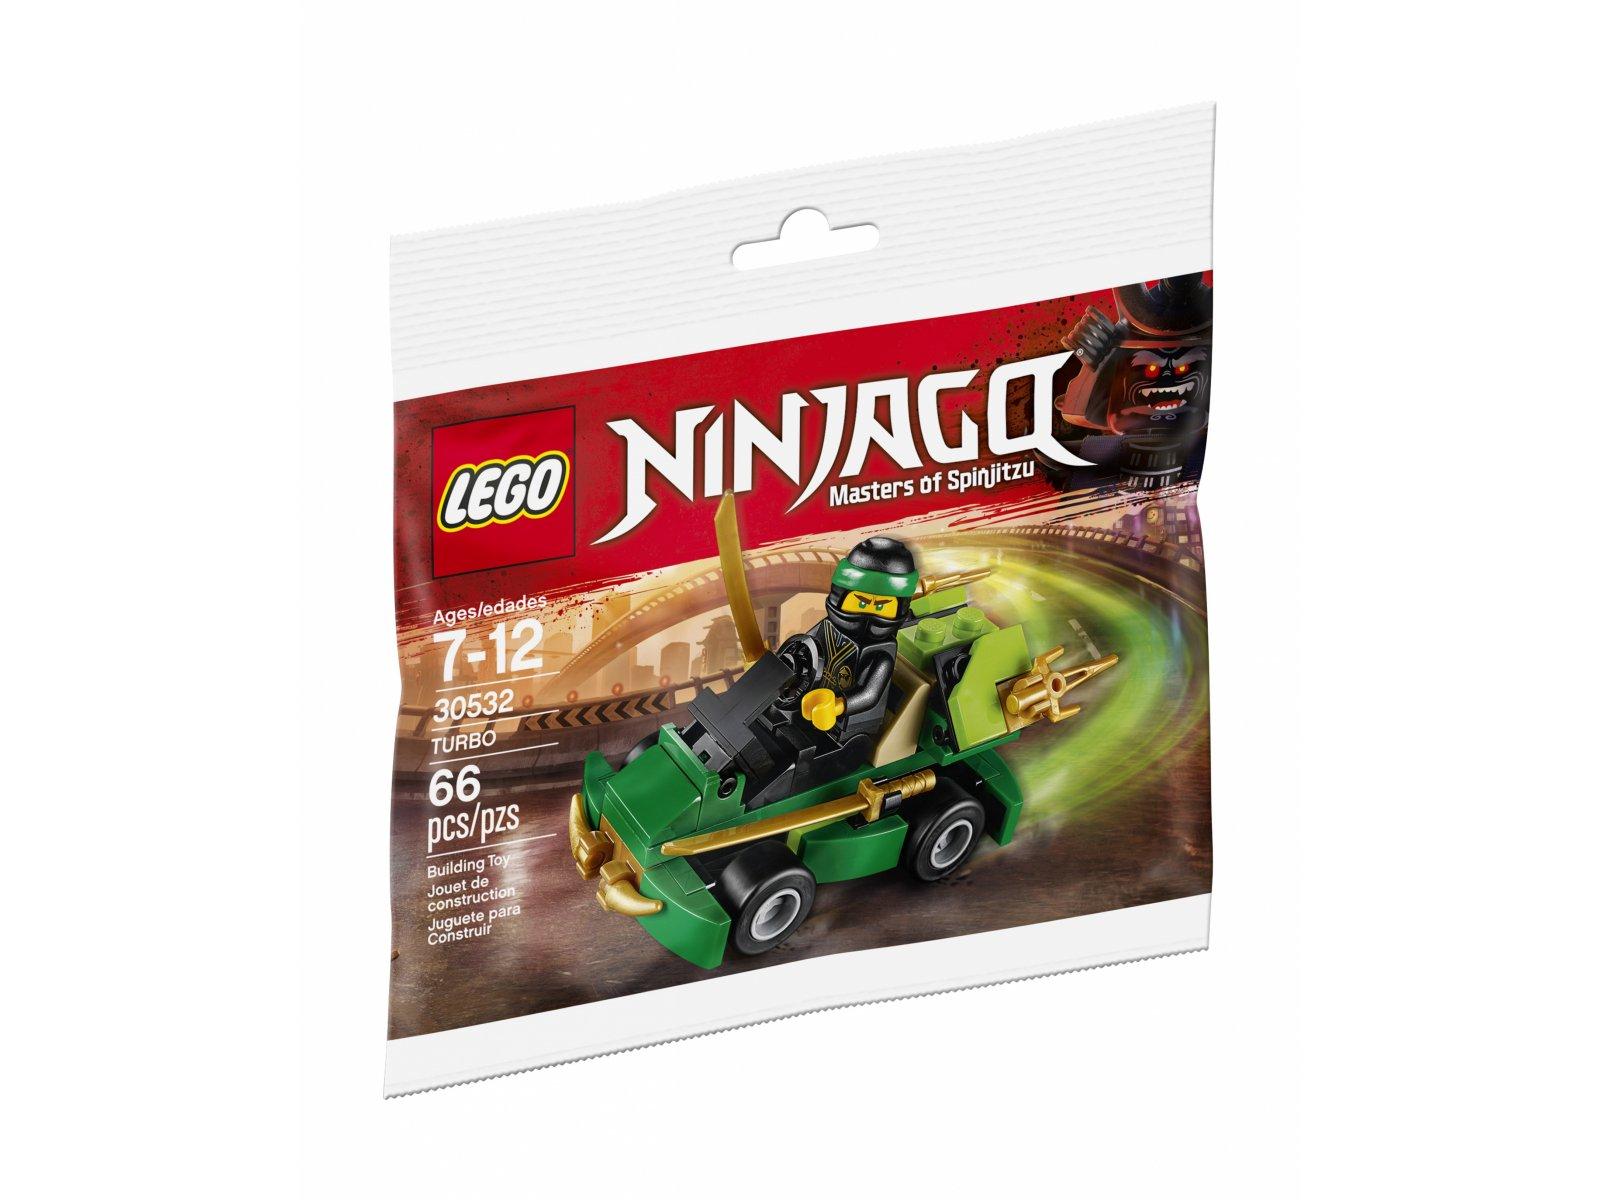 LEGO Ninjago® 30532 TURBO